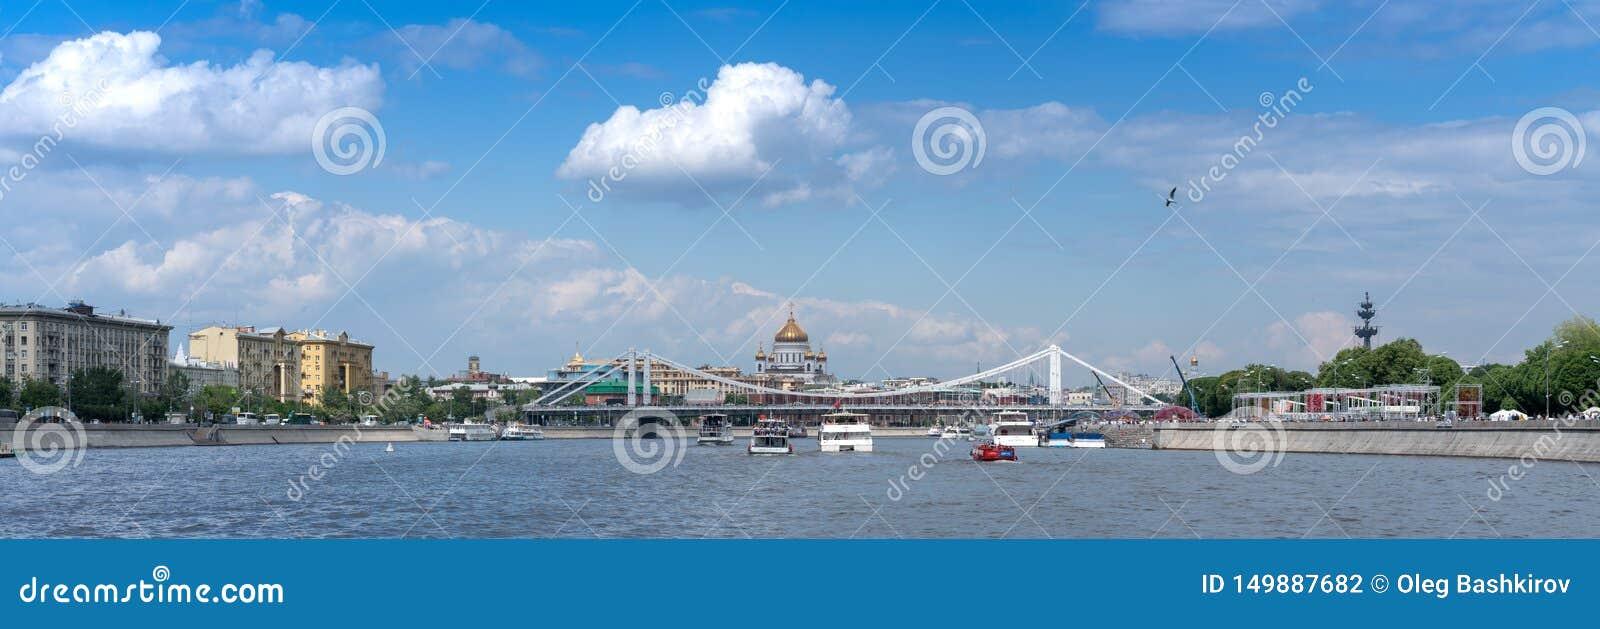 Moskou, Rusland - Mei 26, 2019: Panorama op een Rivier van Moskou